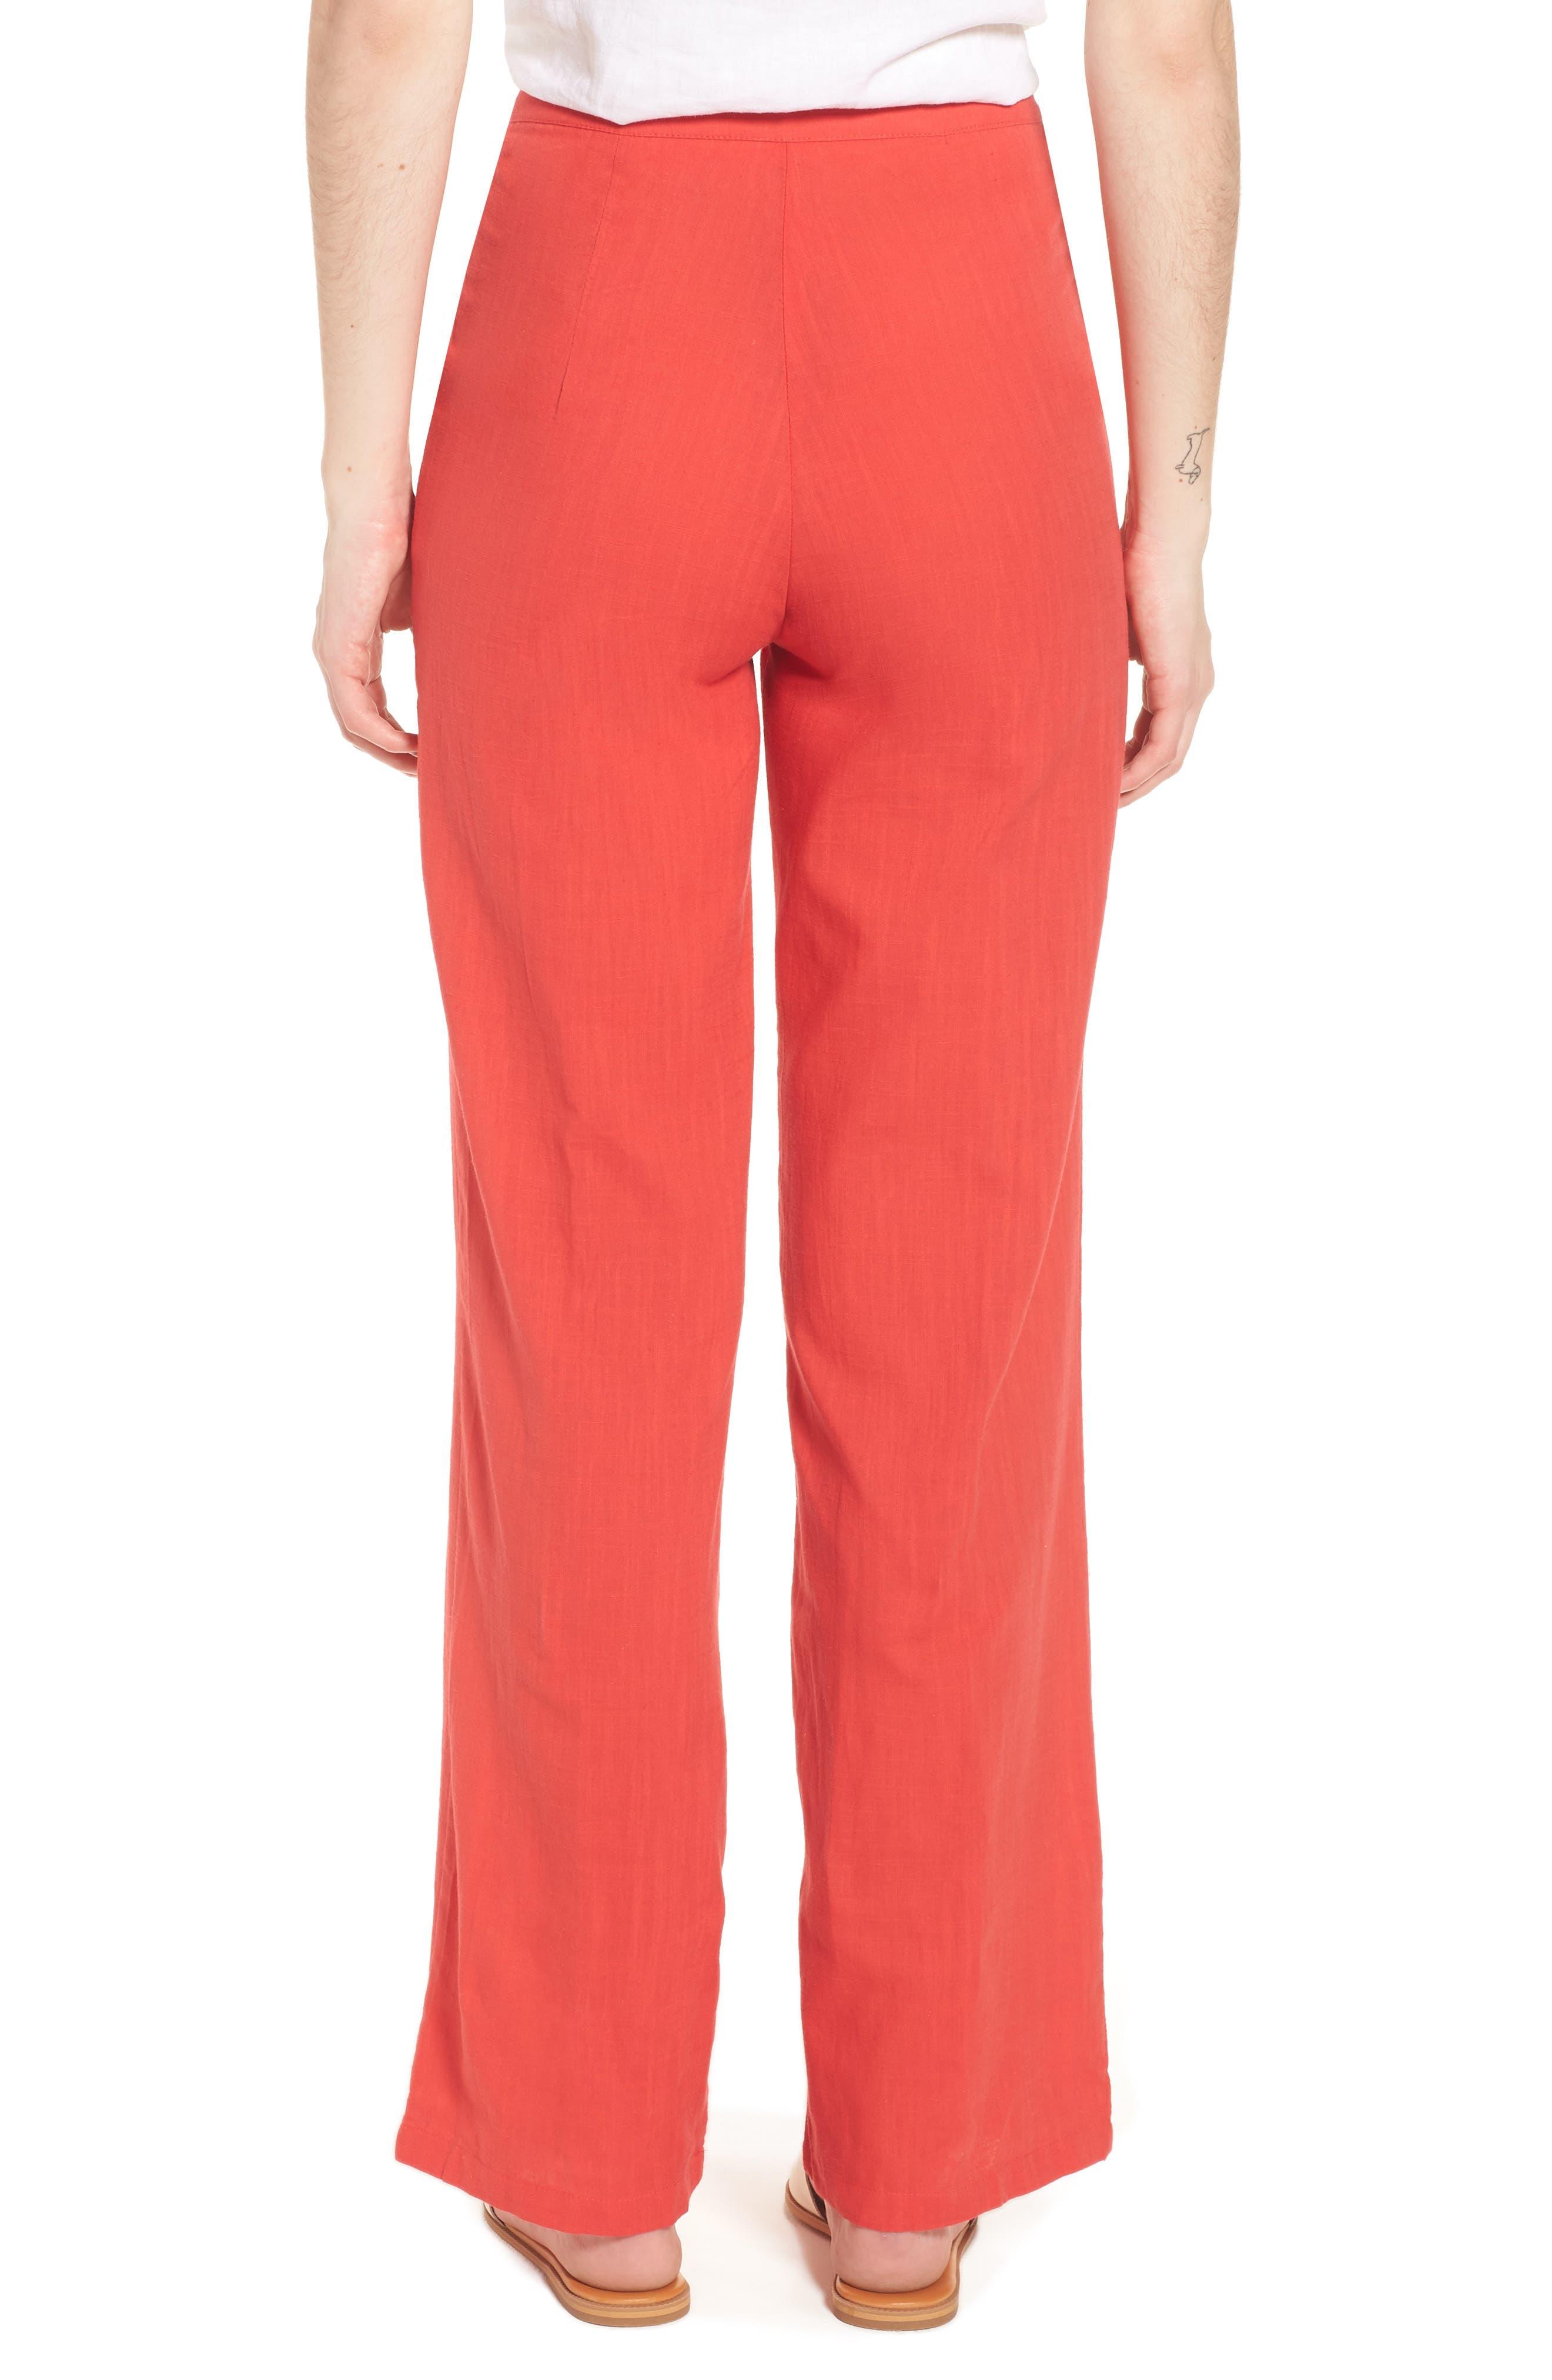 Femme Fatale High Waist Pants,                             Alternate thumbnail 2, color,                             Red